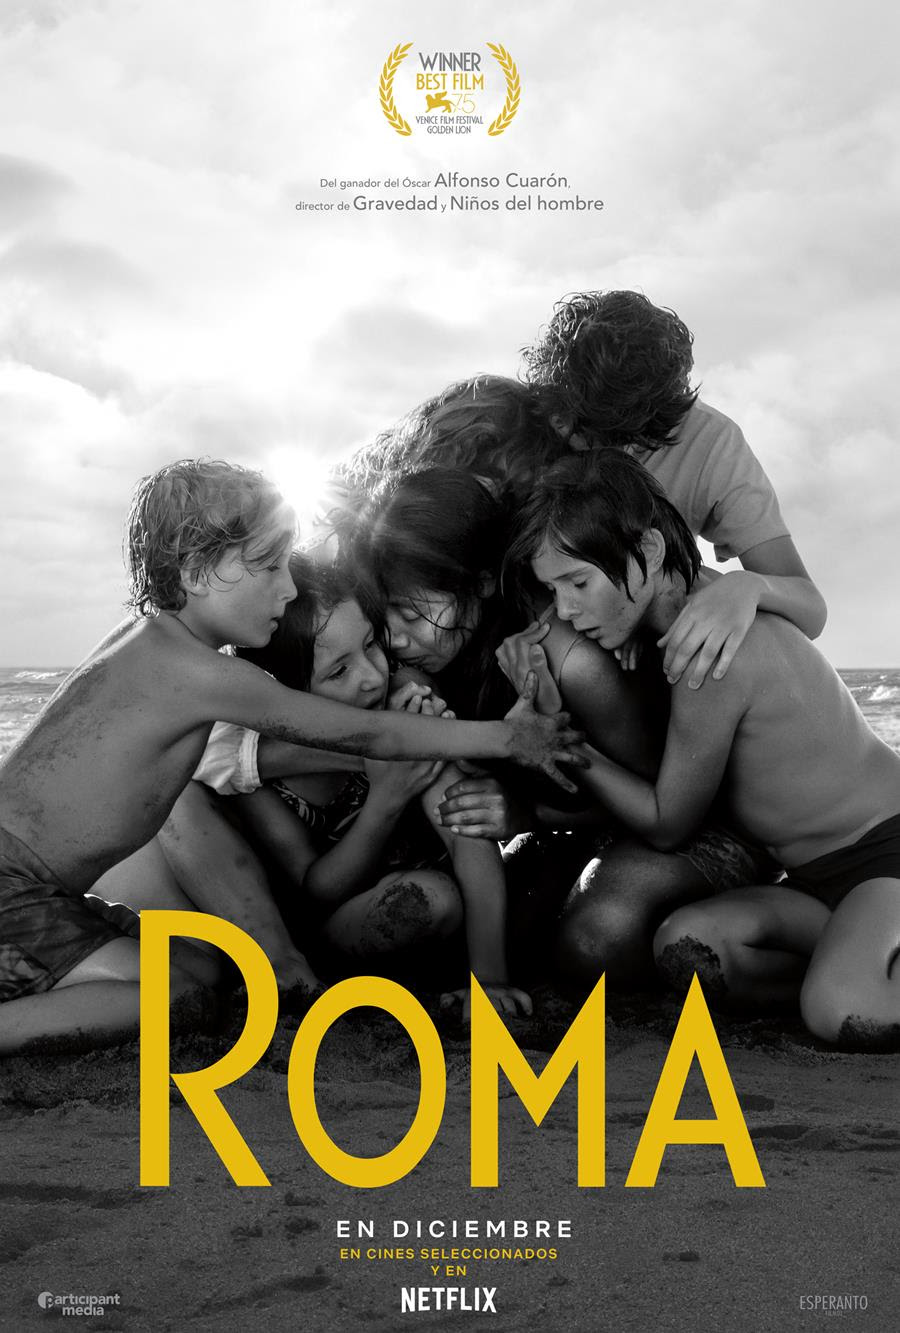 ROMA Poster Netflix.jpg